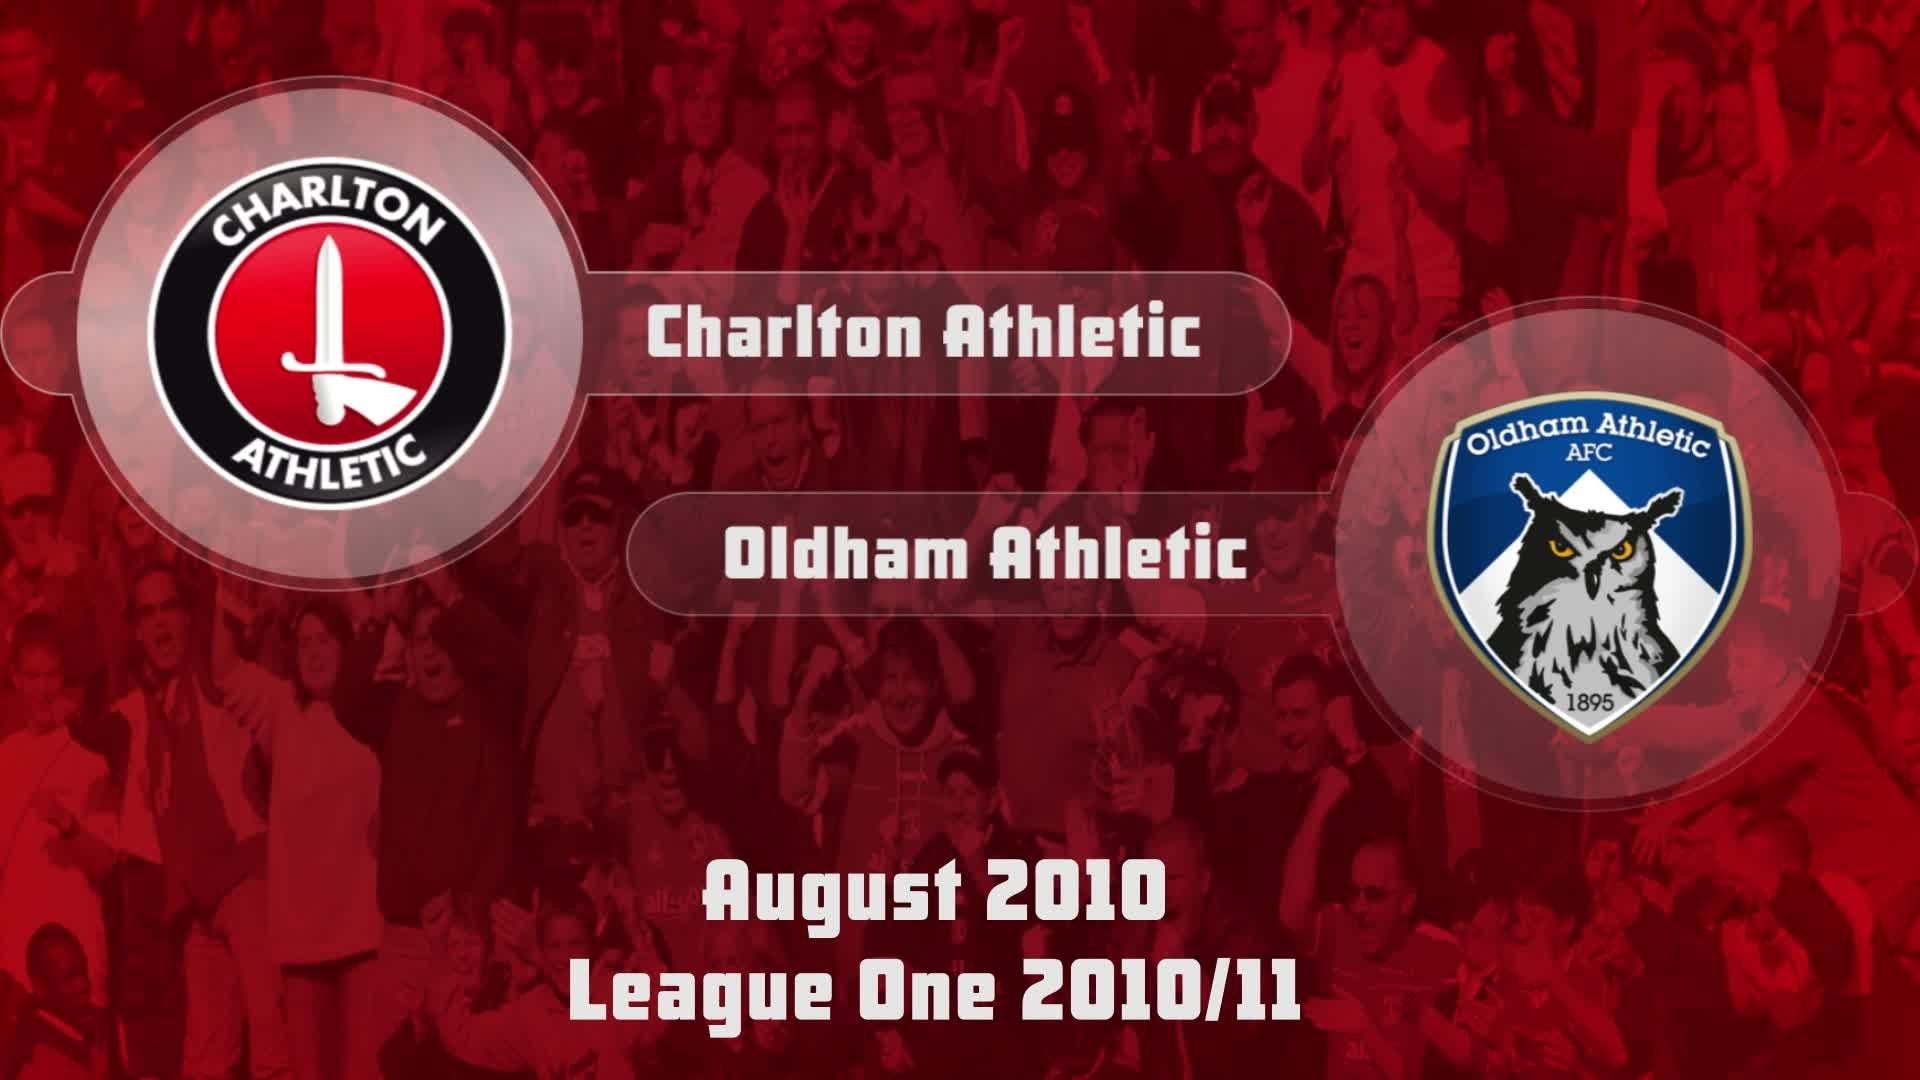 04 HIGHLIGHTS   Charlton 1 Oldham 1 (Aug 2010)